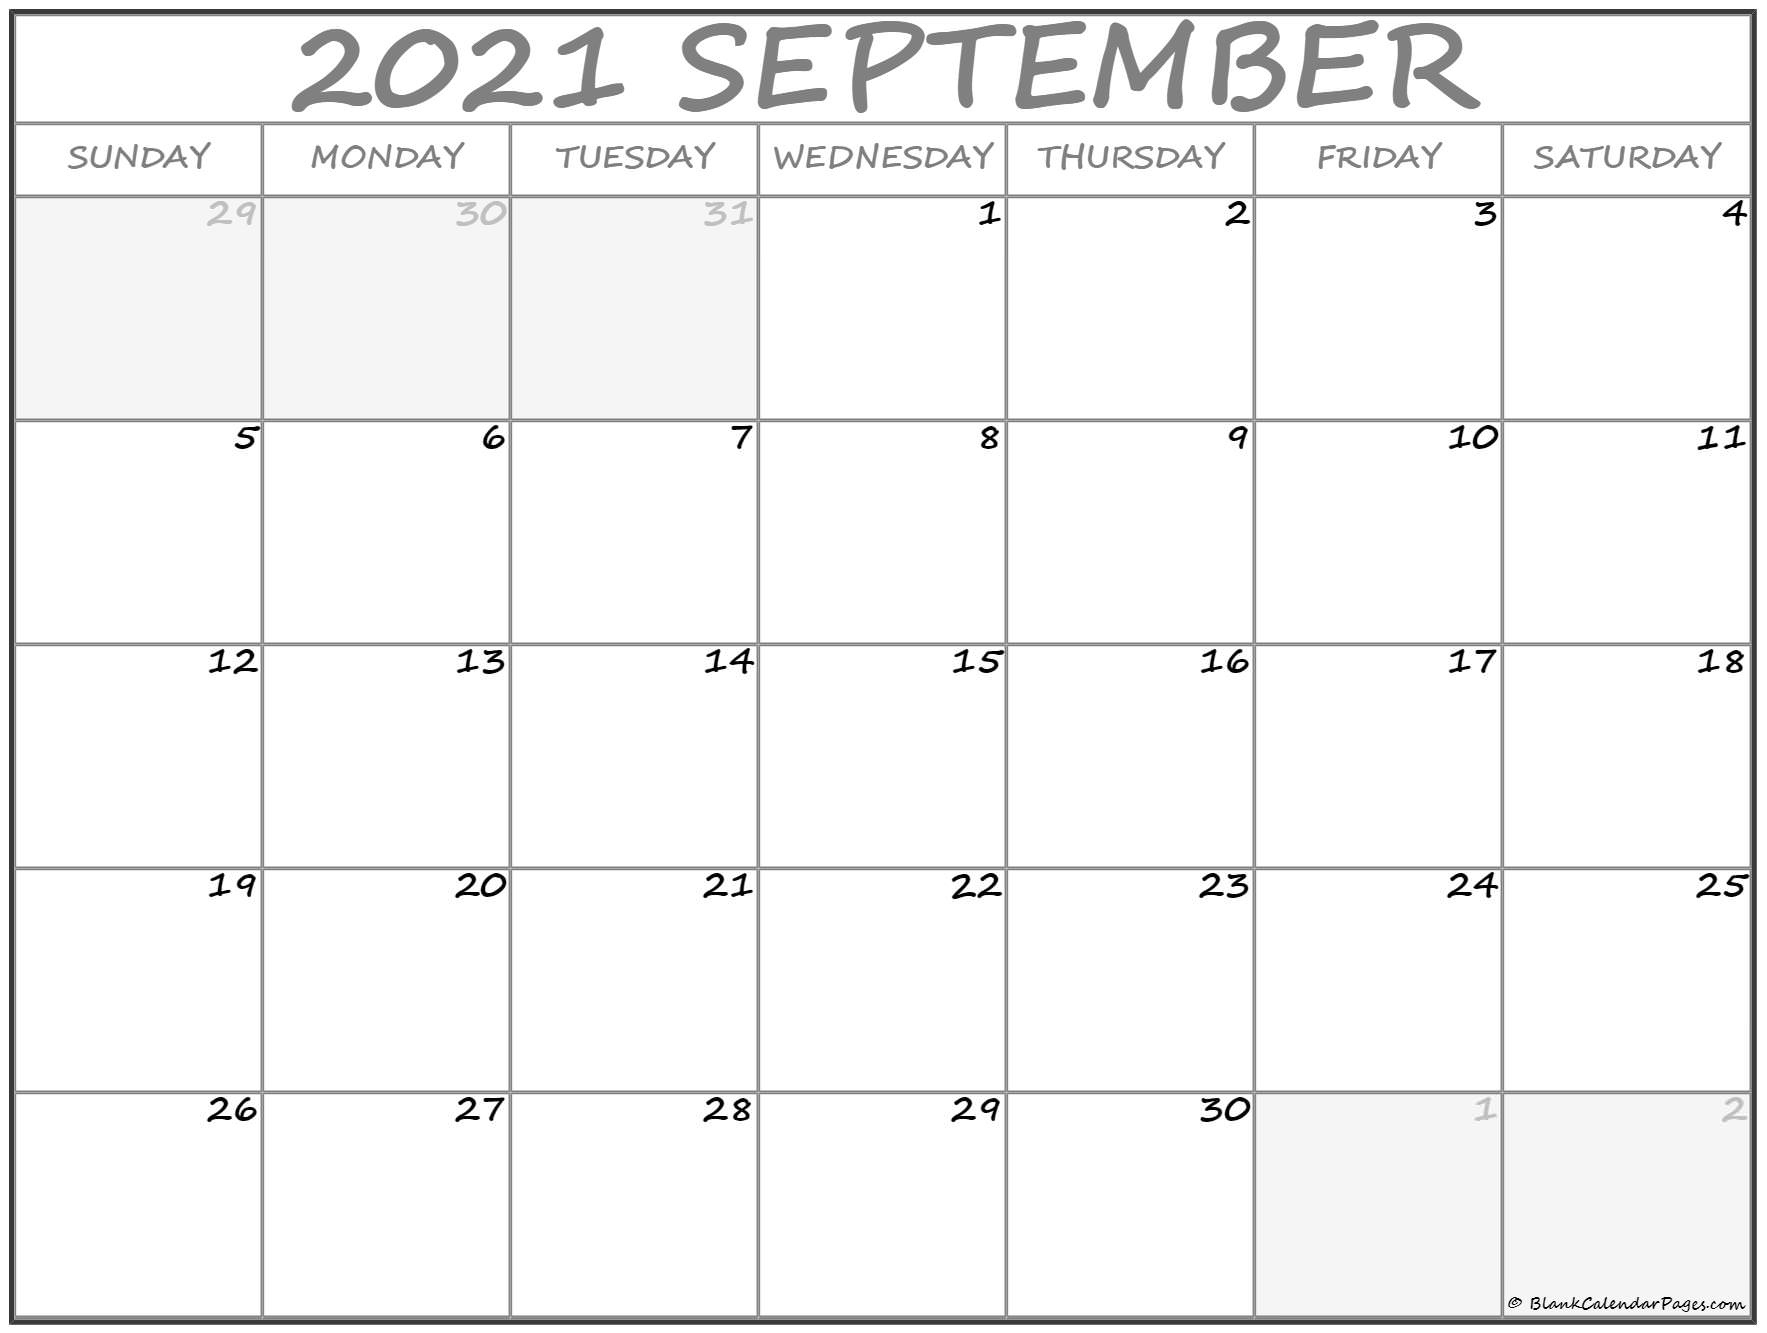 September 2021 Calendar | Free Printable Calendar Templates September To December 2021 Calendar